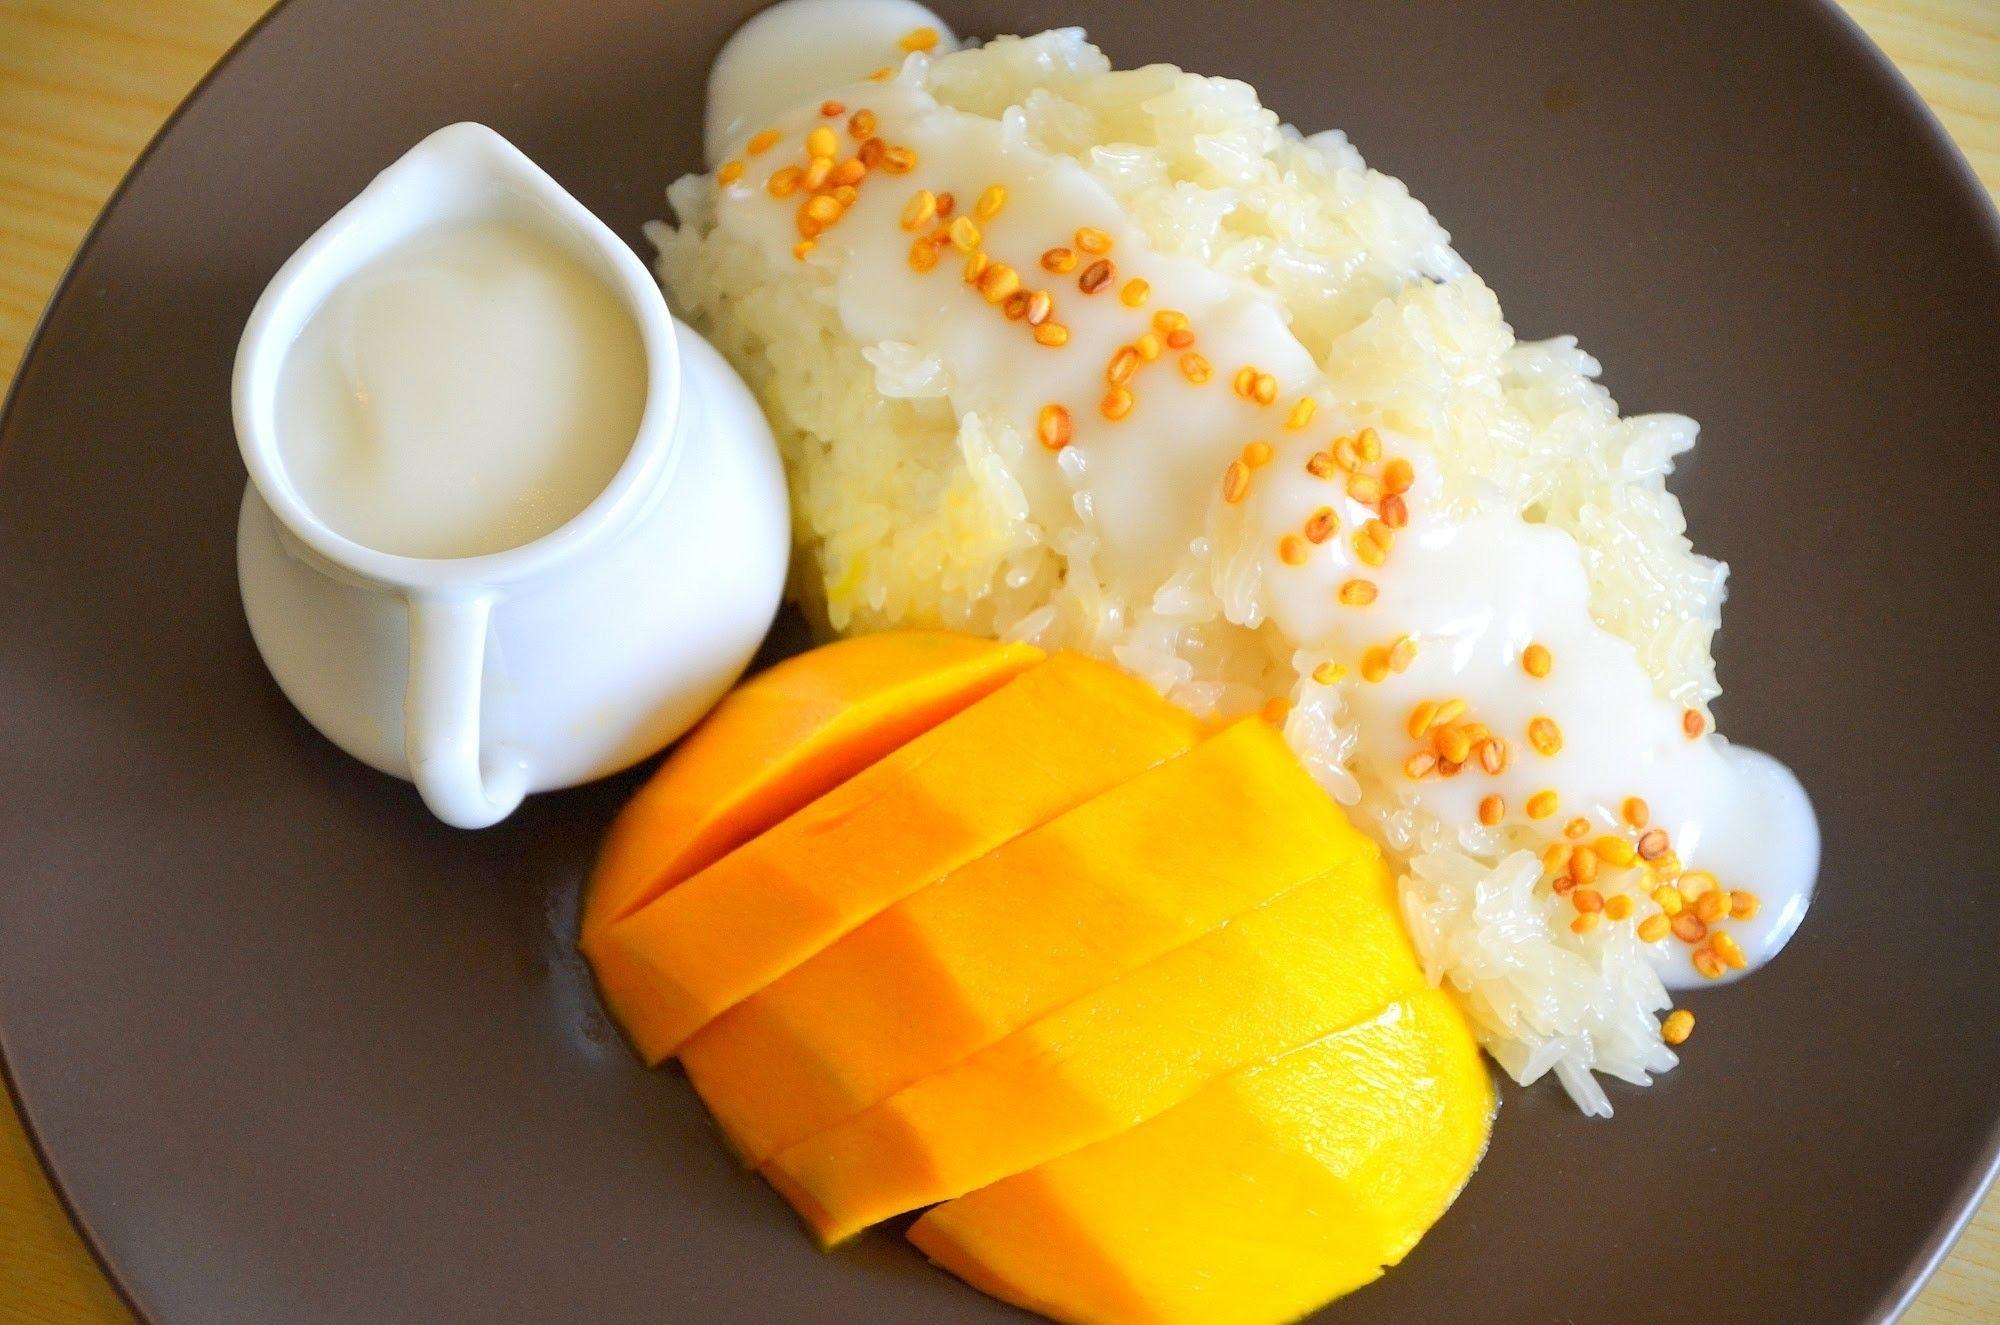 [RESEP] Cobain Bikin Mango Sticky Rice yang Lagi Hits Banget!